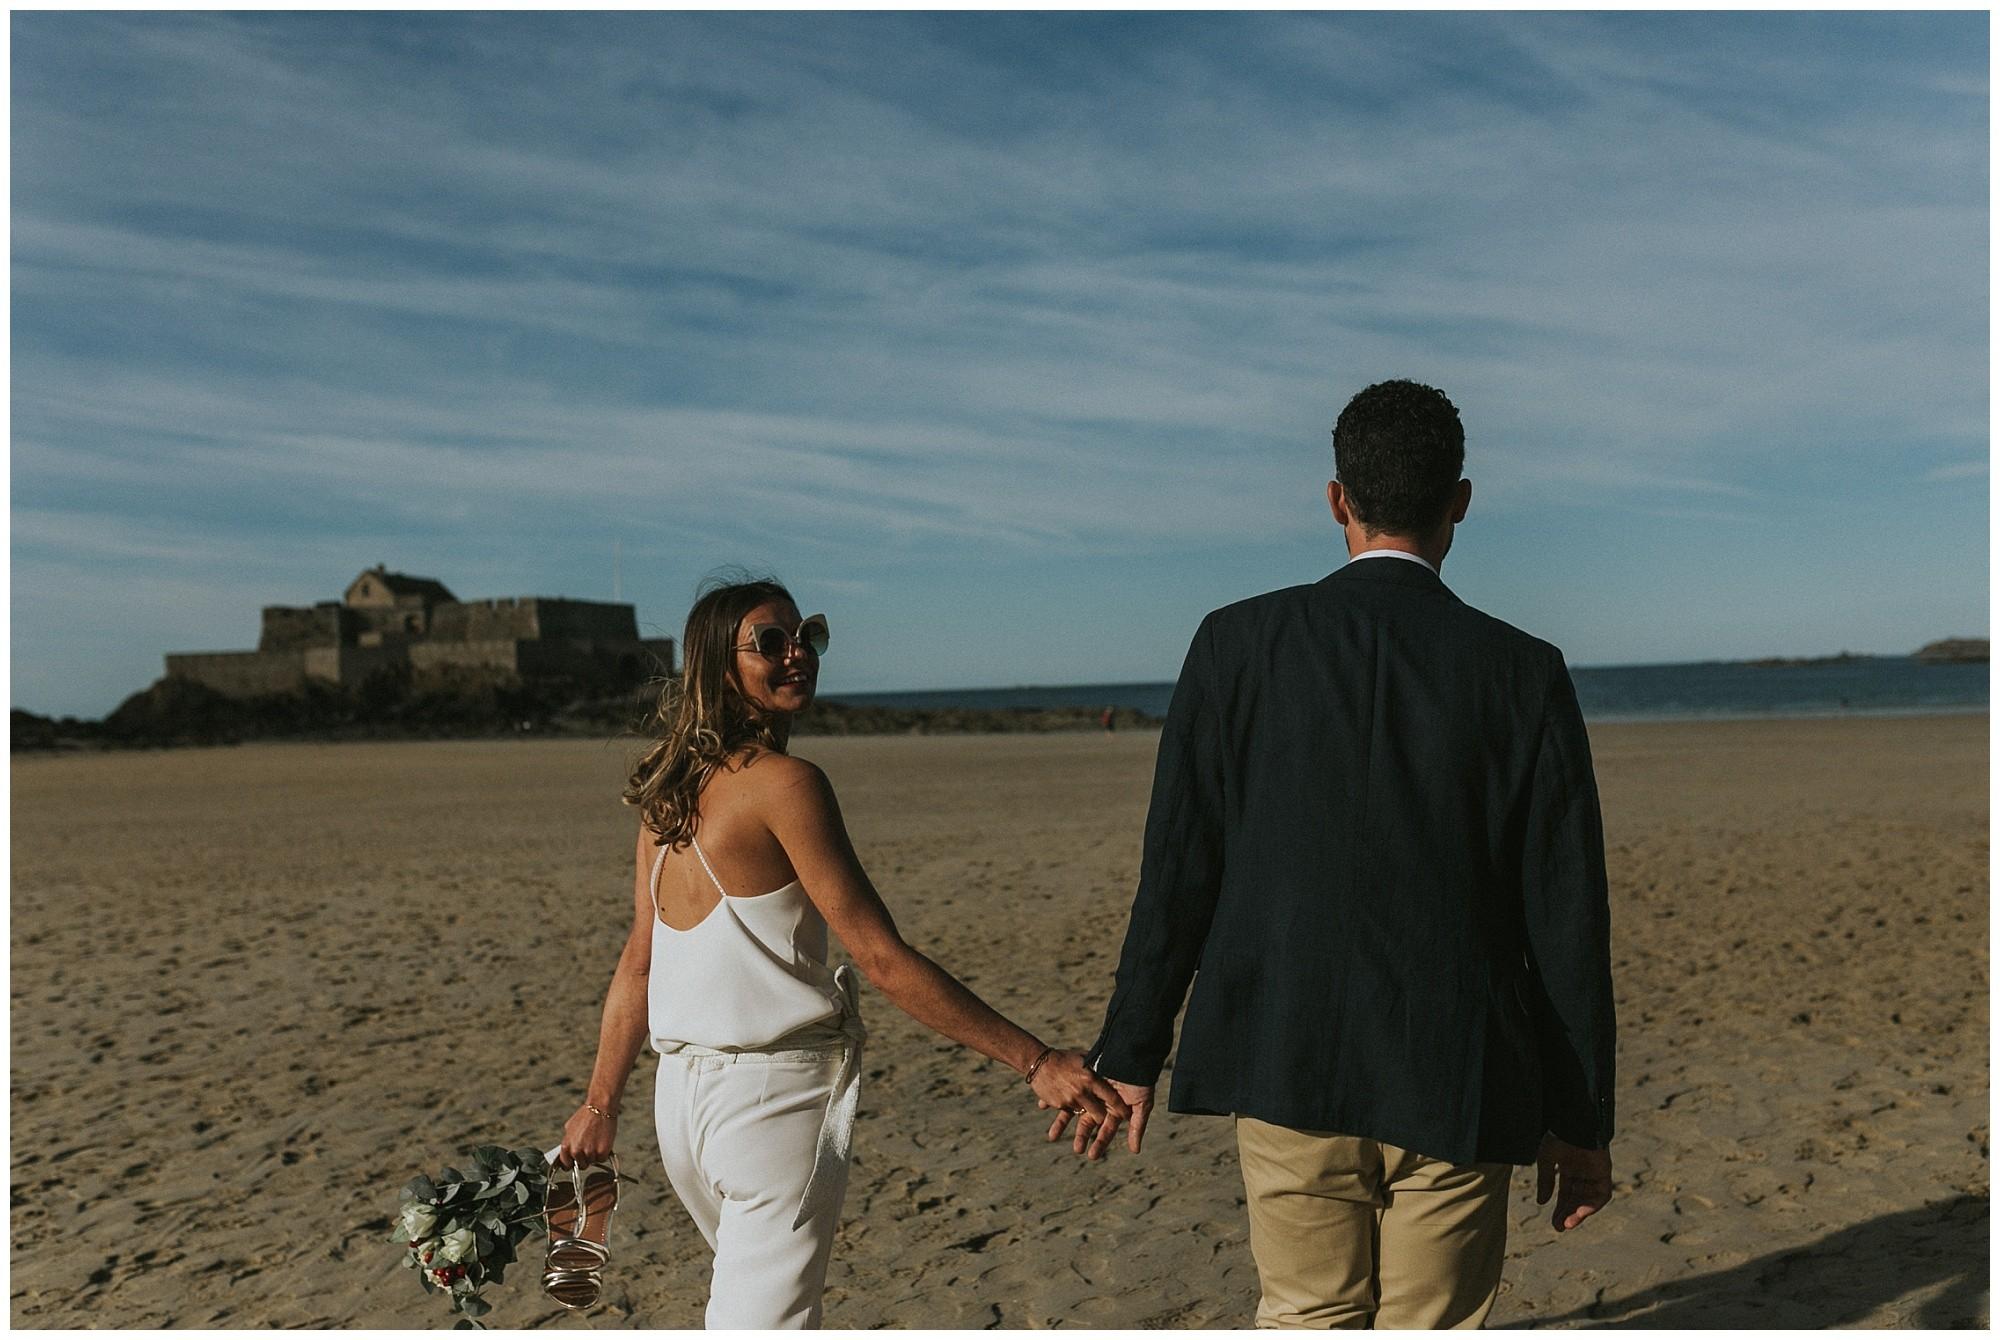 Kateryna-photos-photographe-mariage-bretagne-saint-malo-finistere-cotes-darmor-wedding_0061.jpg